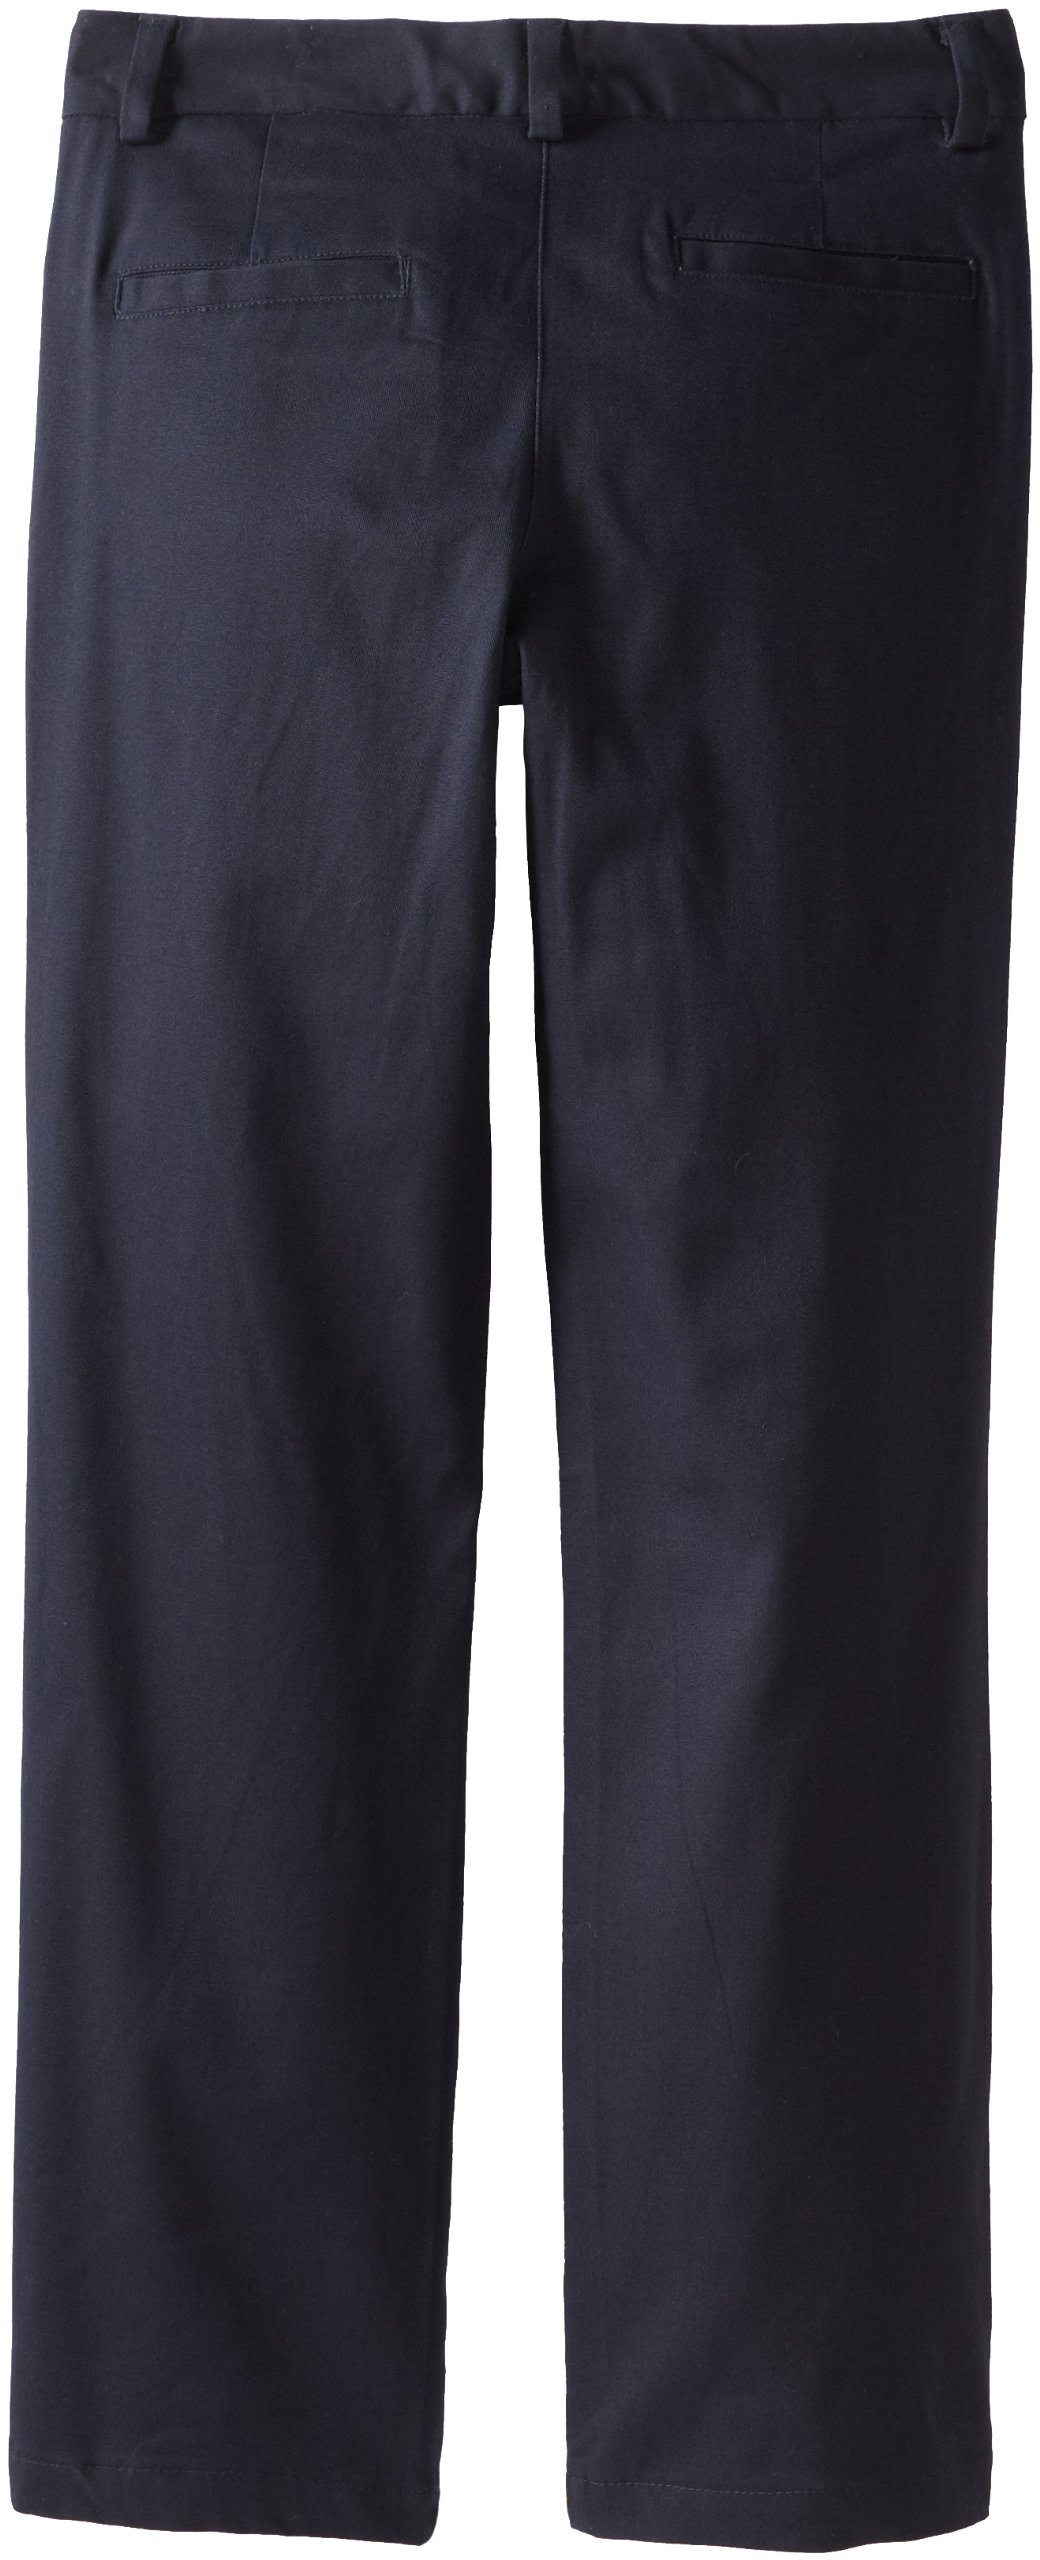 Nautica Big Girls' Uniform Stretch Twill Bootcut Pant, Su Navy,7 by Nautica (Image #2)